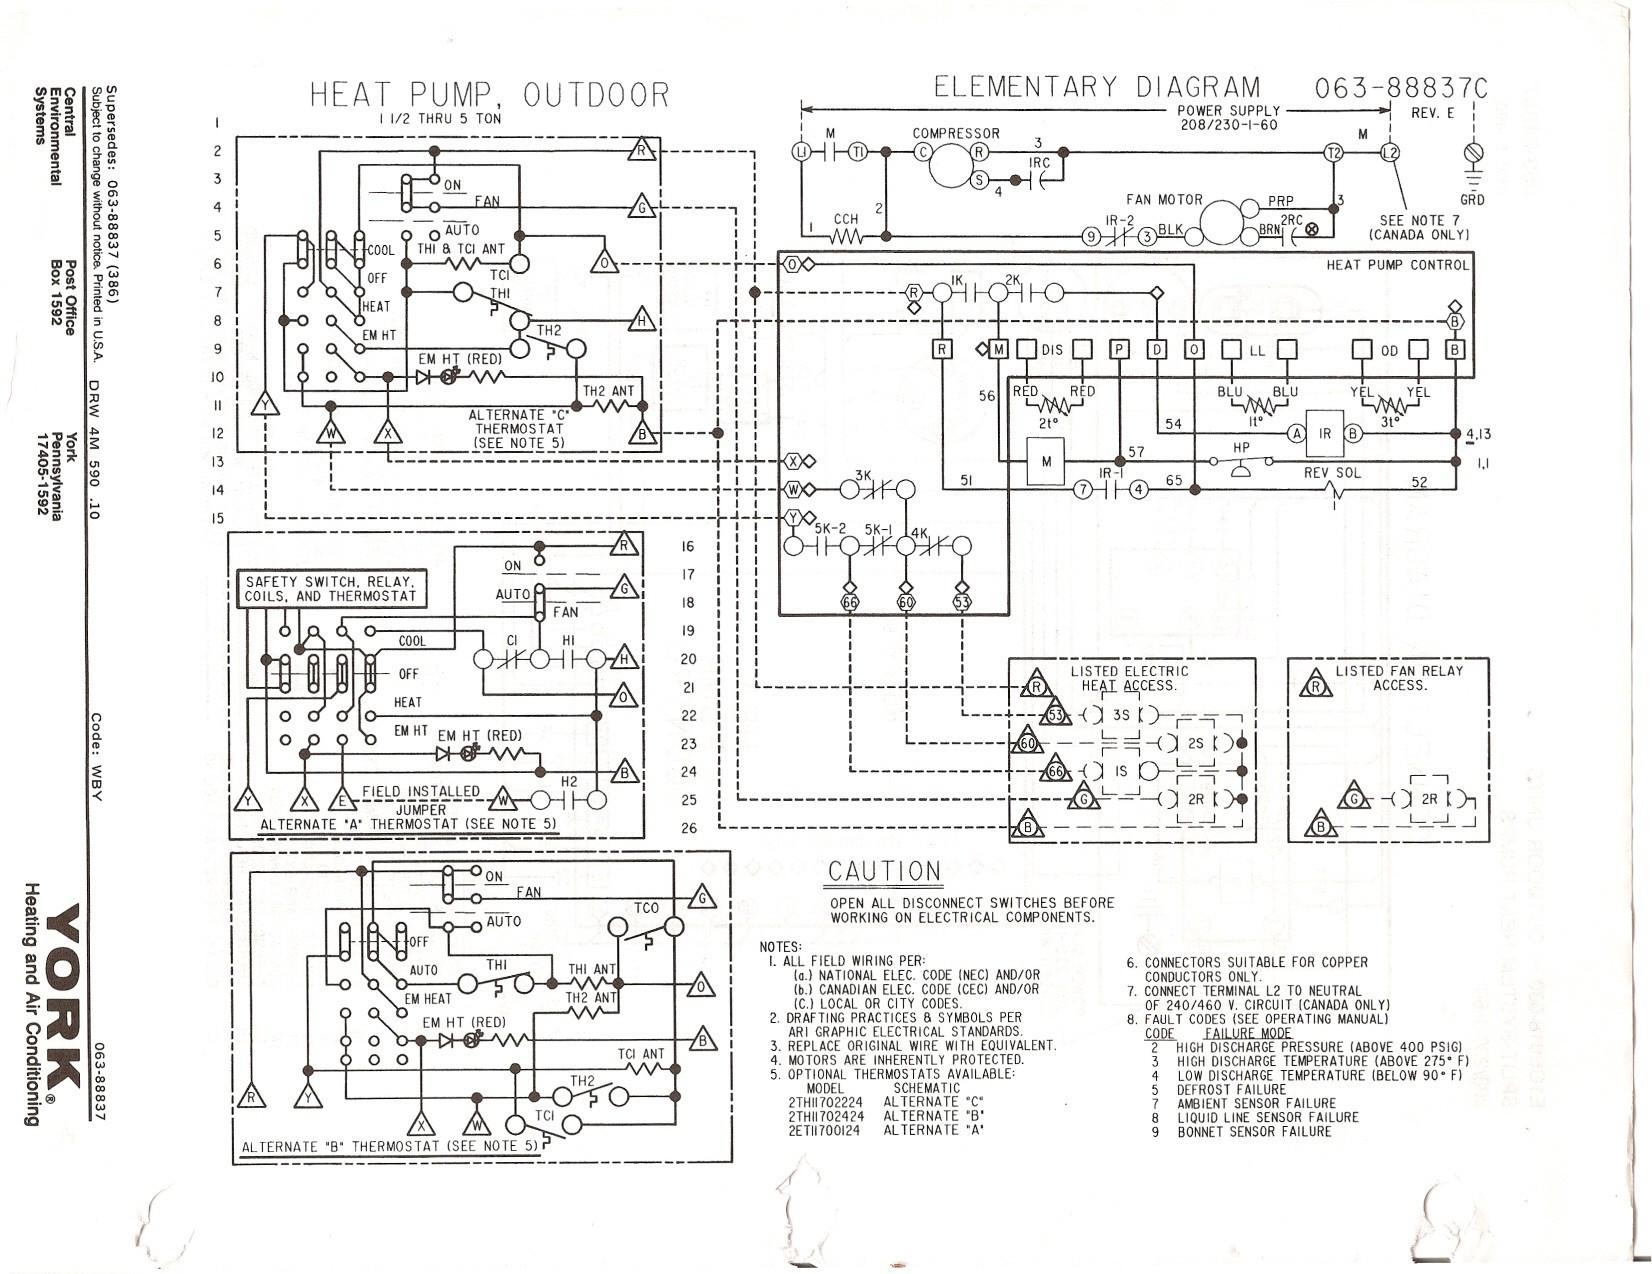 goodman heat pump air handler wiring diagram Download-Goodman Heat Pump Thermostat Wiring Diagram New Generous York Air Handler Inspiration Strip 8 18-a